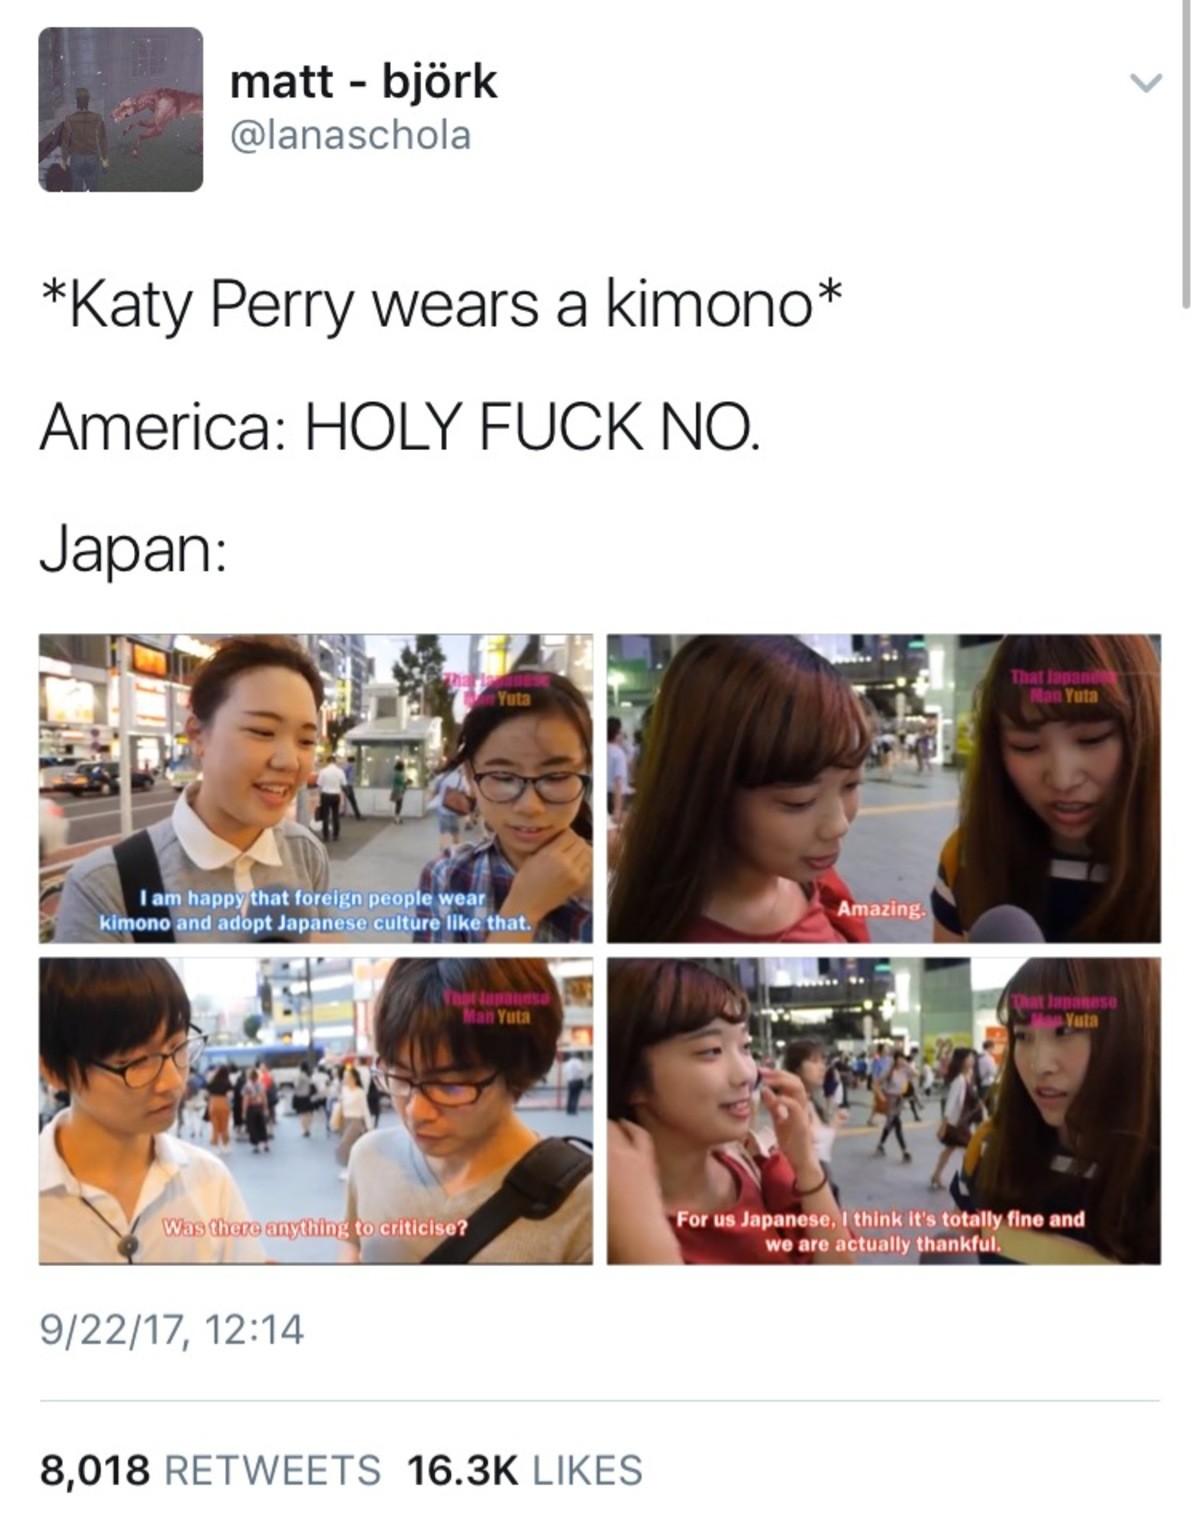 Gasumpoome Ziduscu Lurmakl. >proximal. matt - sniirk v Katy Perry wears a kimono America: HOLY FUCK NO. Japan: iai am foreign I' Tish himdon and culture Him  Gasumpoome Ziduscu Lurmakl >proximal matt - sniirk v Katy Perry wears a kimono America: HOLY FUCK NO Japan: iai am foreign I' Tish himdon and culture Him